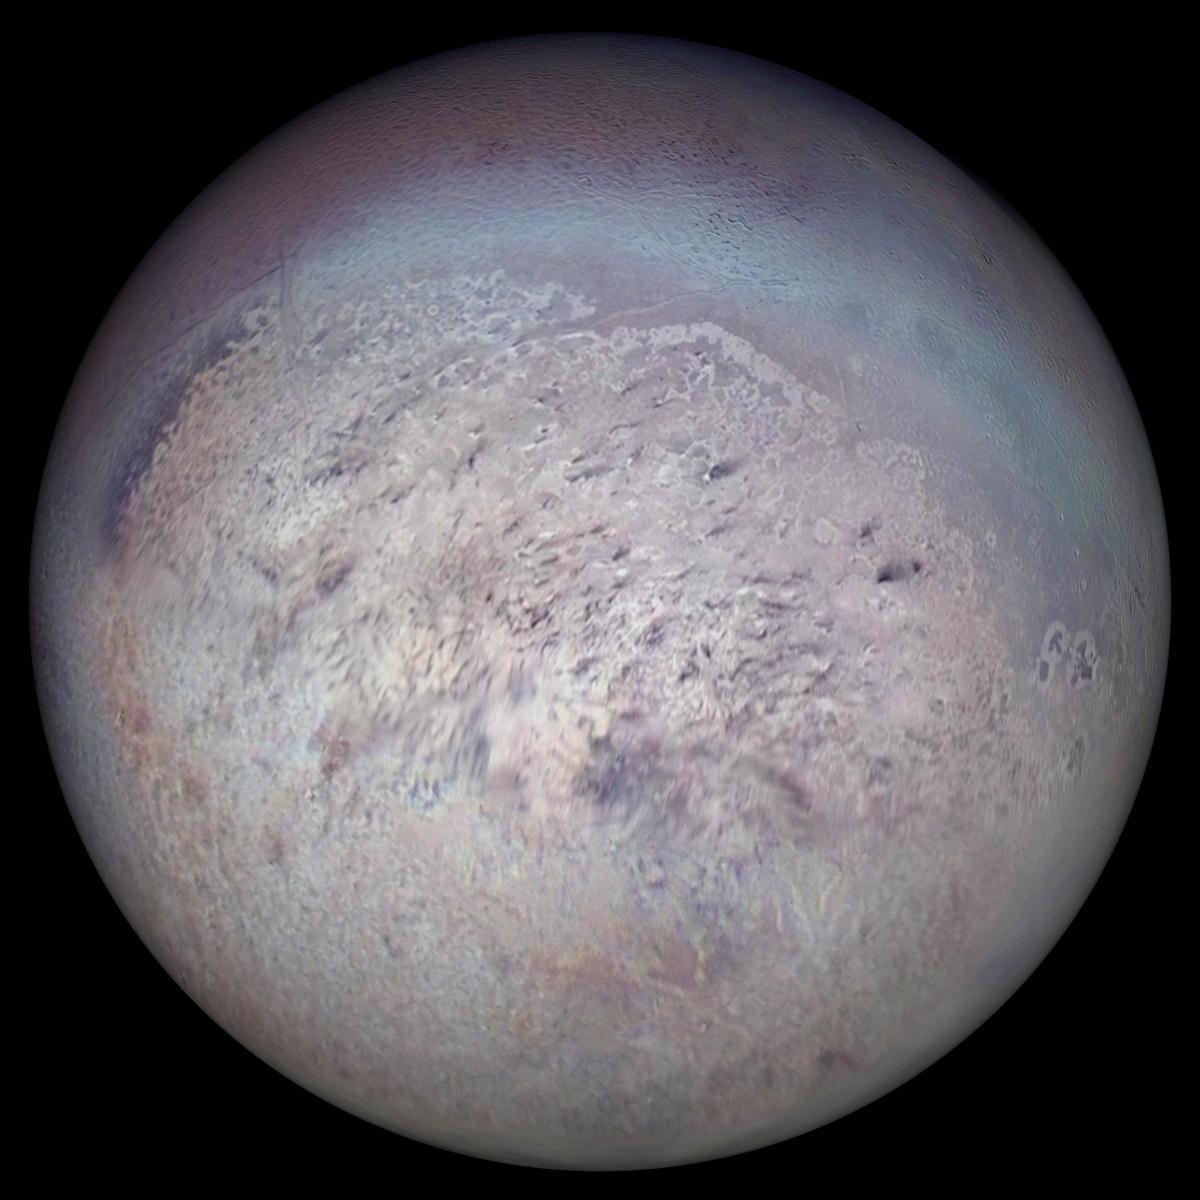 Тритон – спутник с задатками планеты